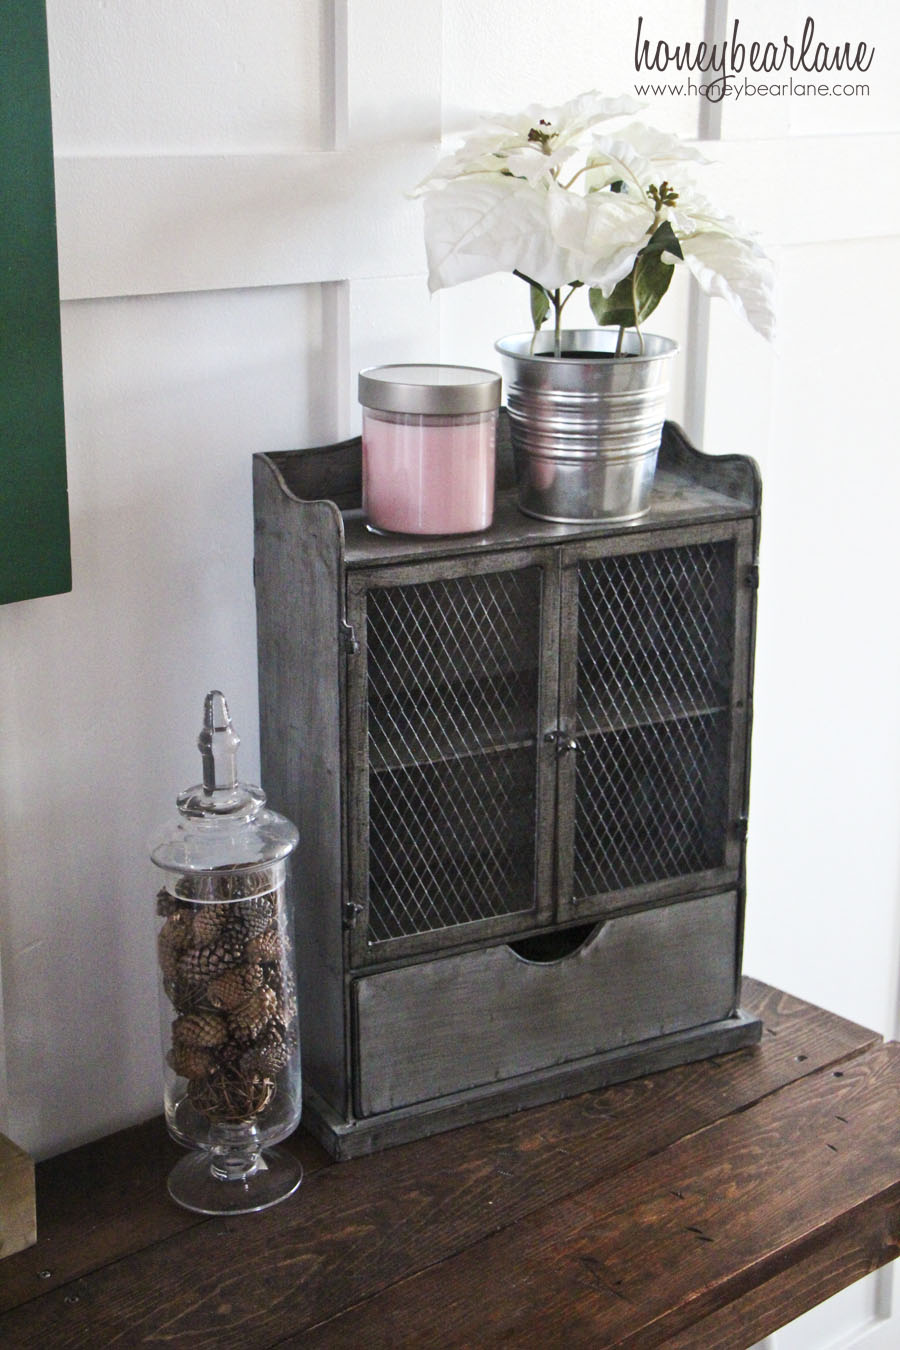 Metal Foyer Cabinet : Rustic entryway honeybear lane